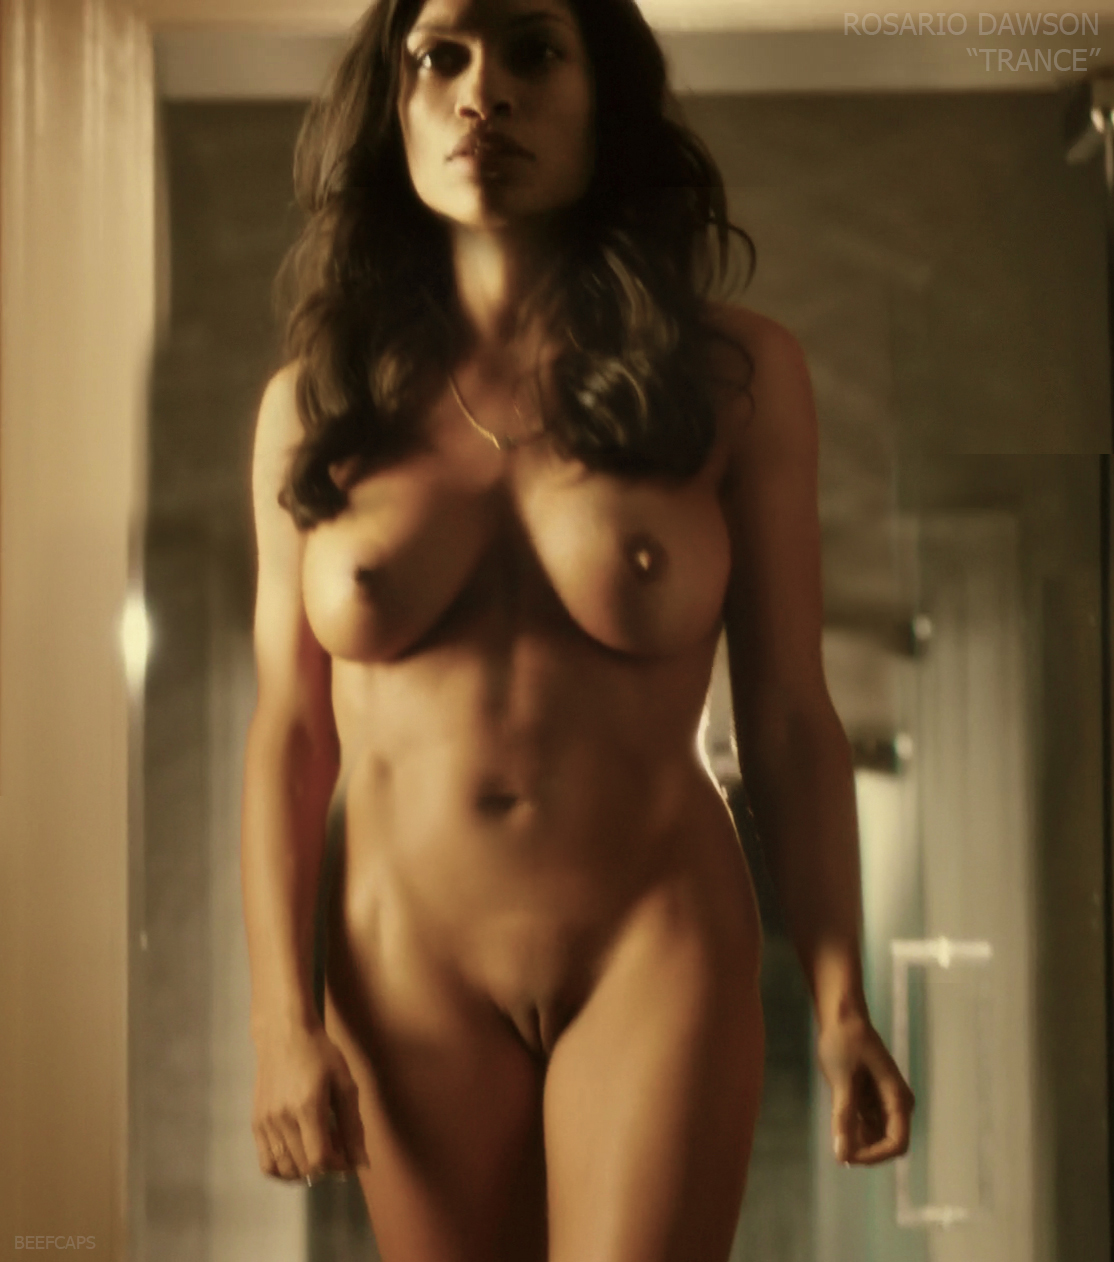 Розарио доусон пороно видео фото 221-38